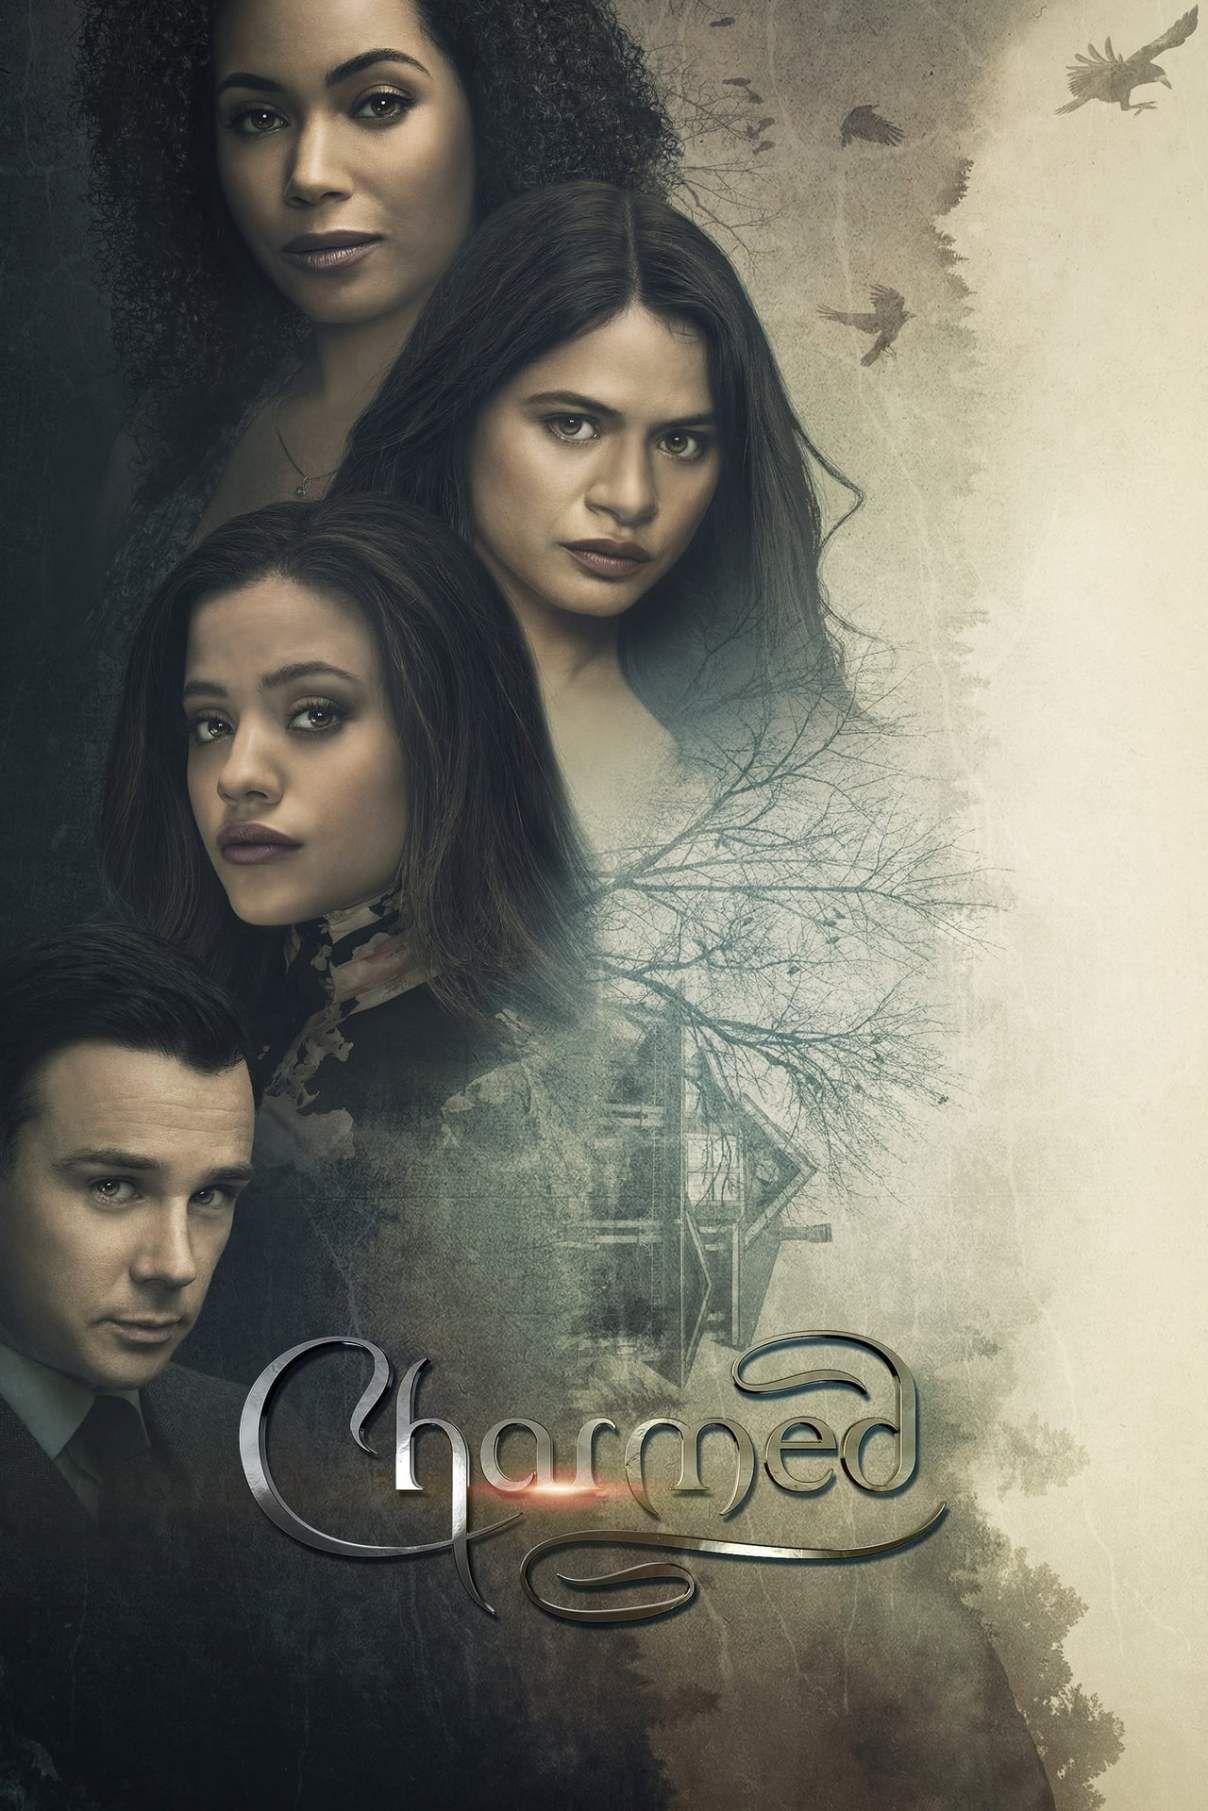 Charmed 2020 Season 2 Episode 11 Charmed Tv Charmed Tv Show Charmed Sisters